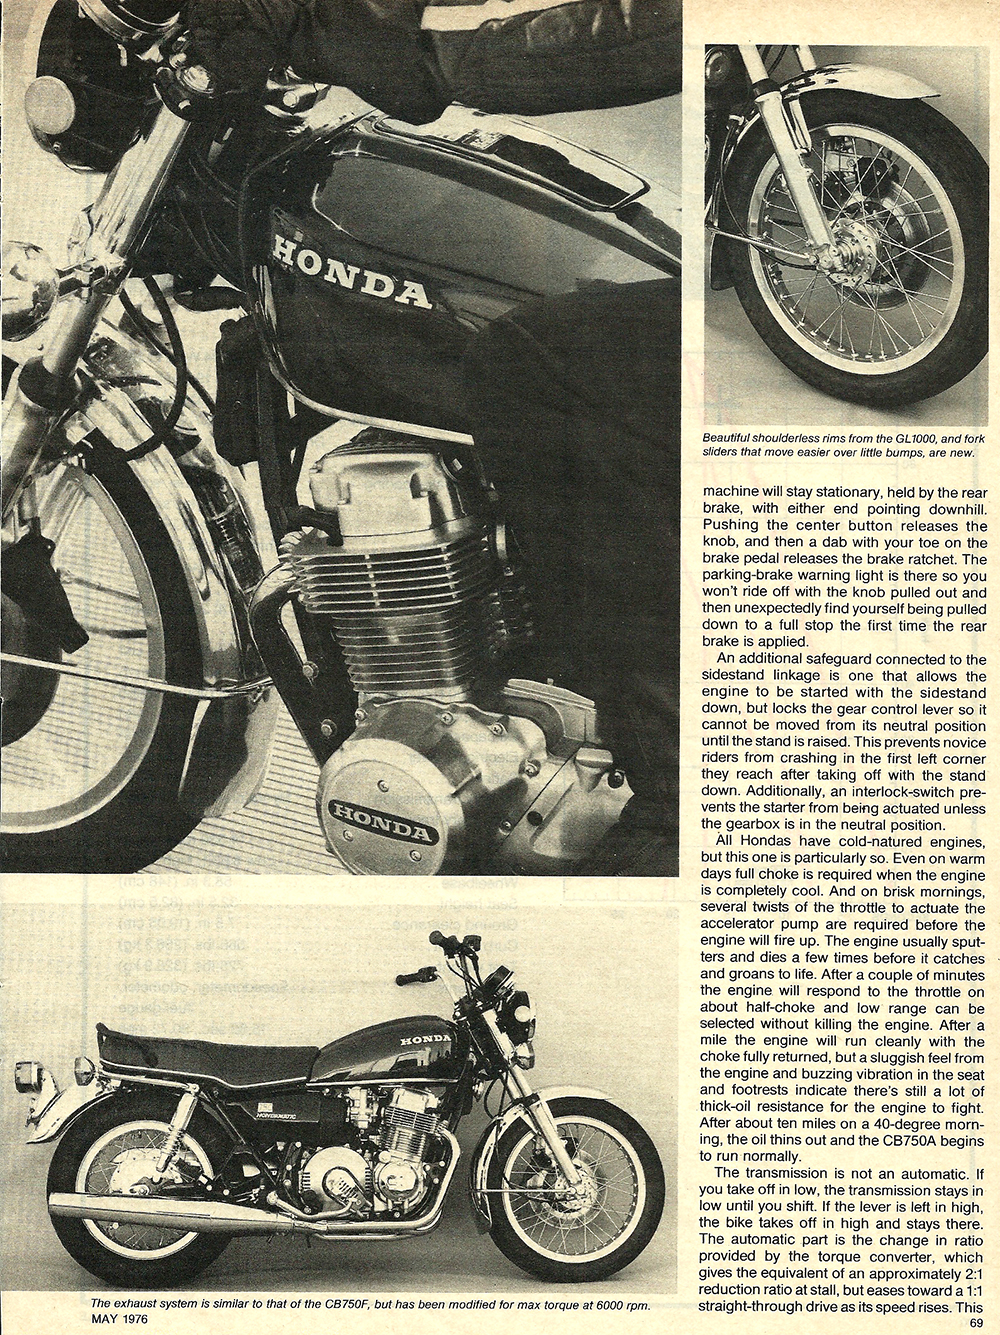 1976 Honda CB750A road test 4.JPG